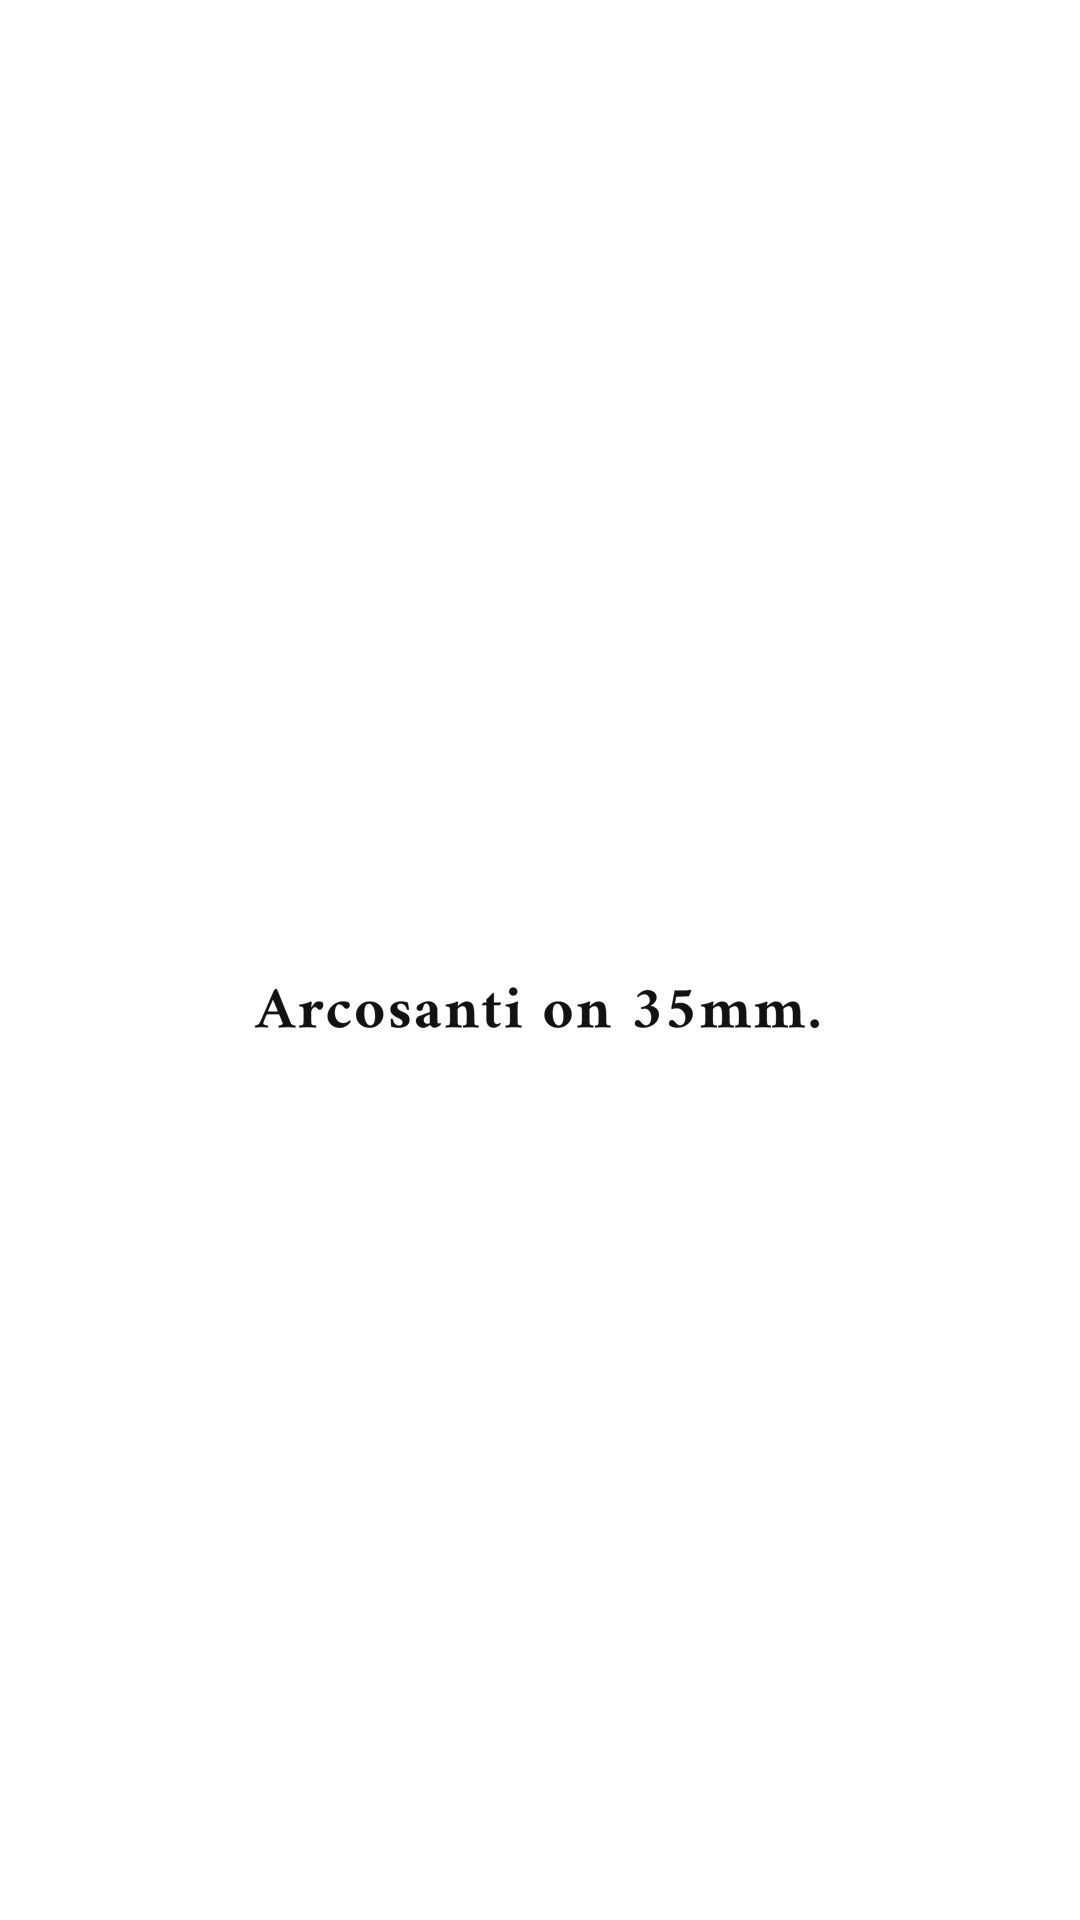 IMG_1864.JPG